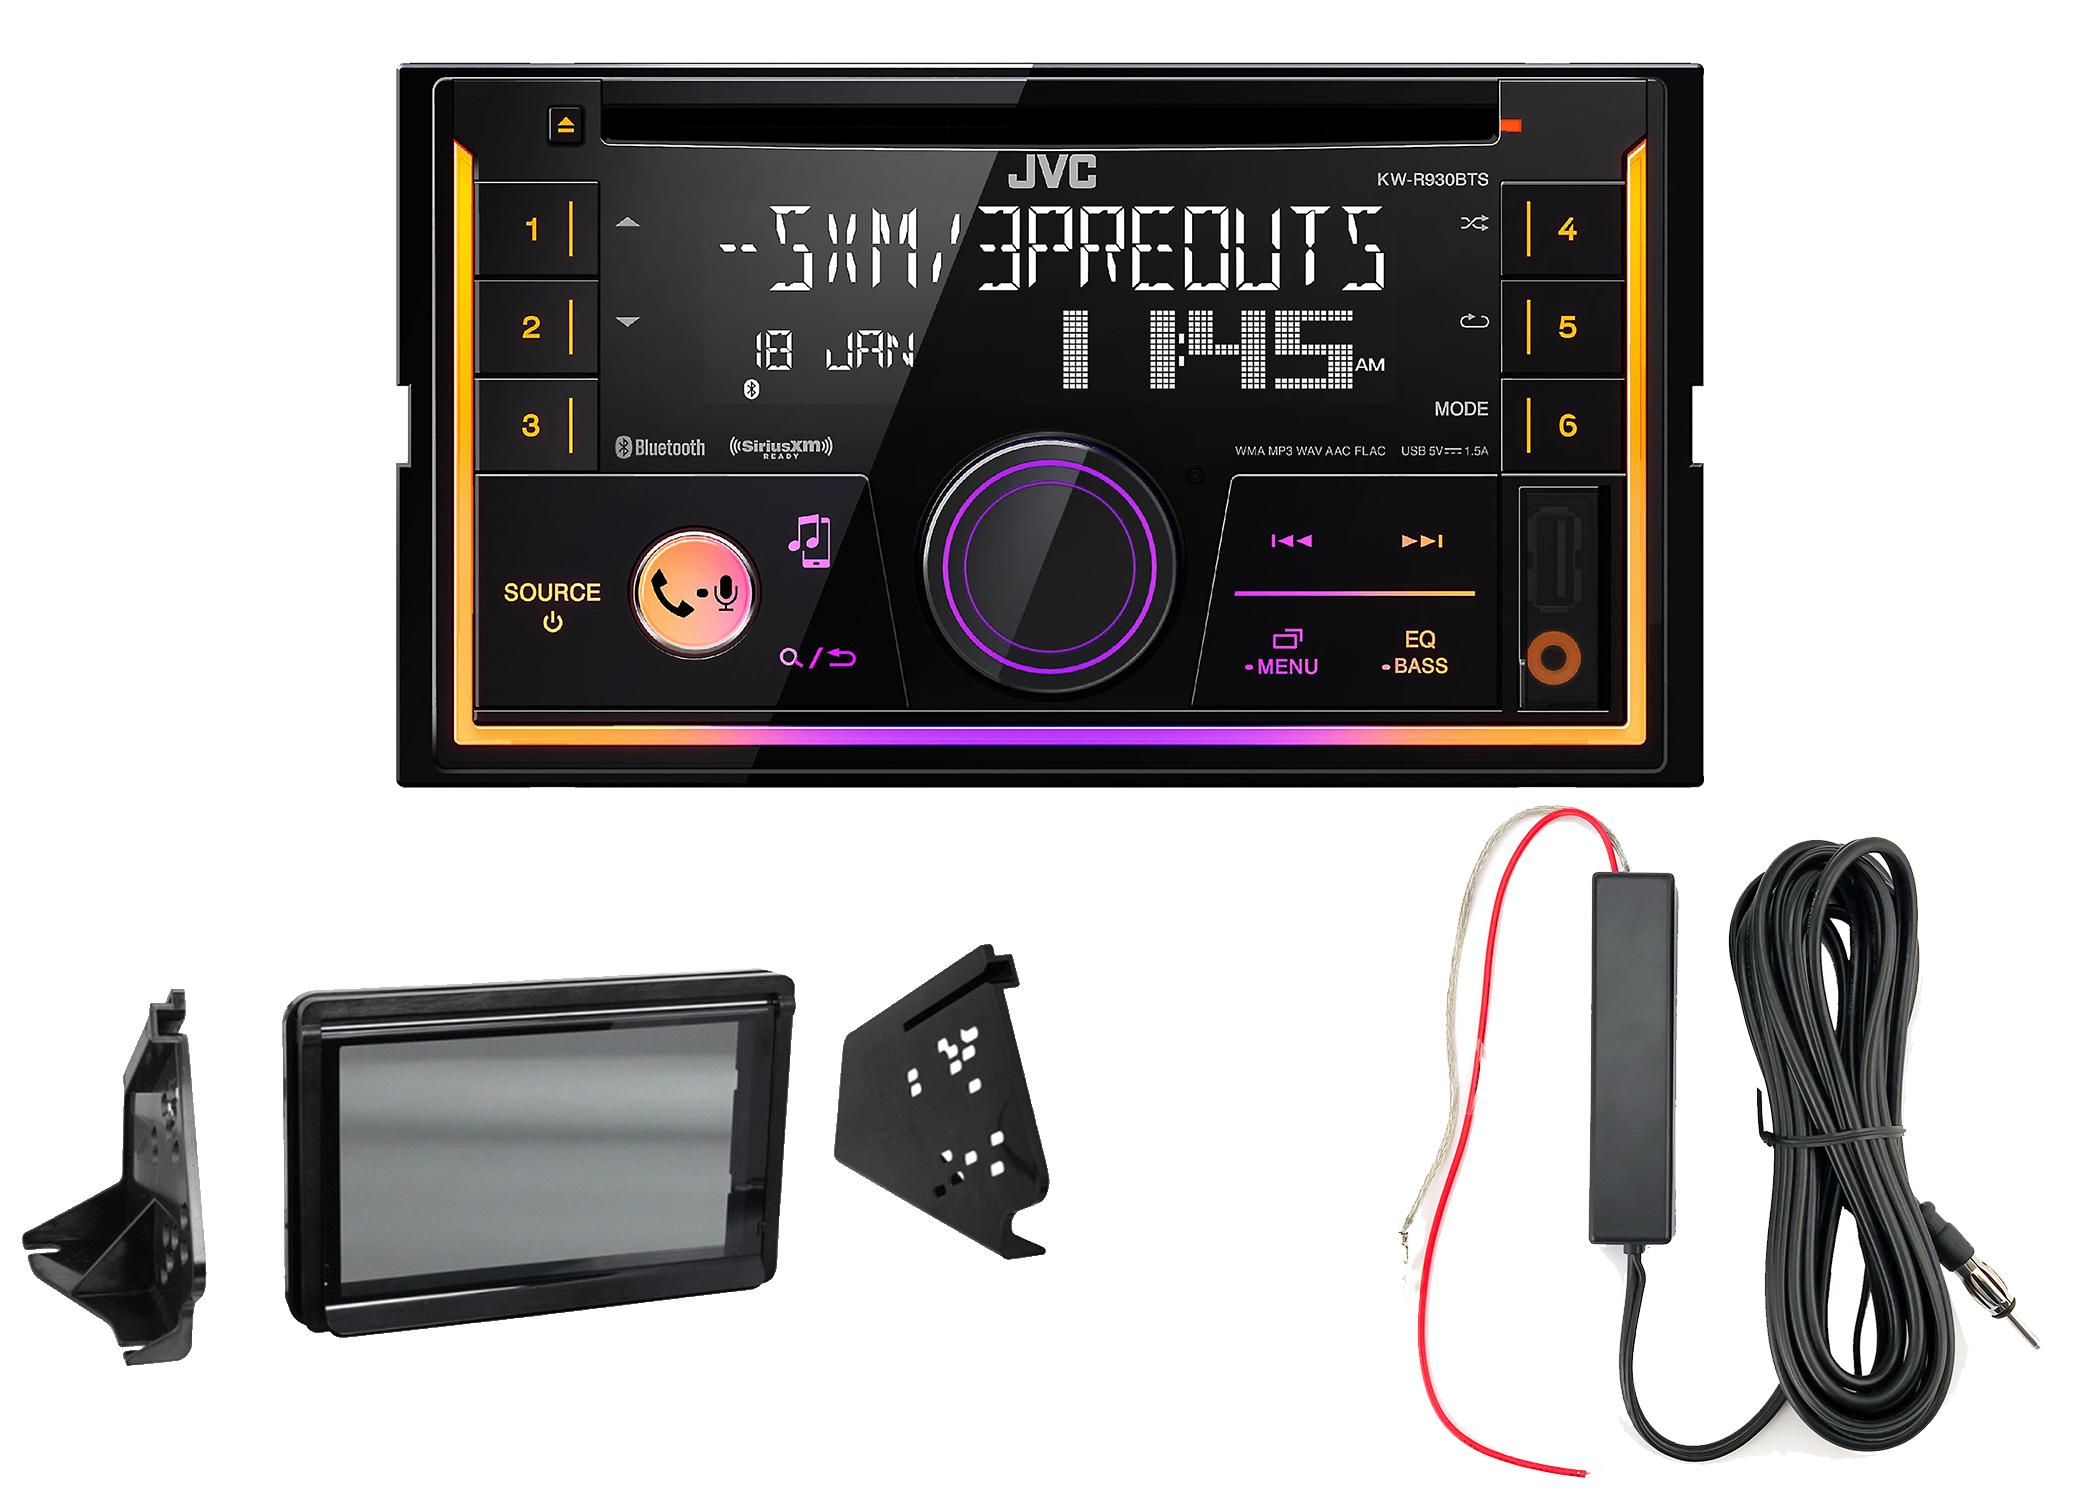 Metra Polaris Splash Guard Backup Camera Pyle Touchscreen CD Radio Harness